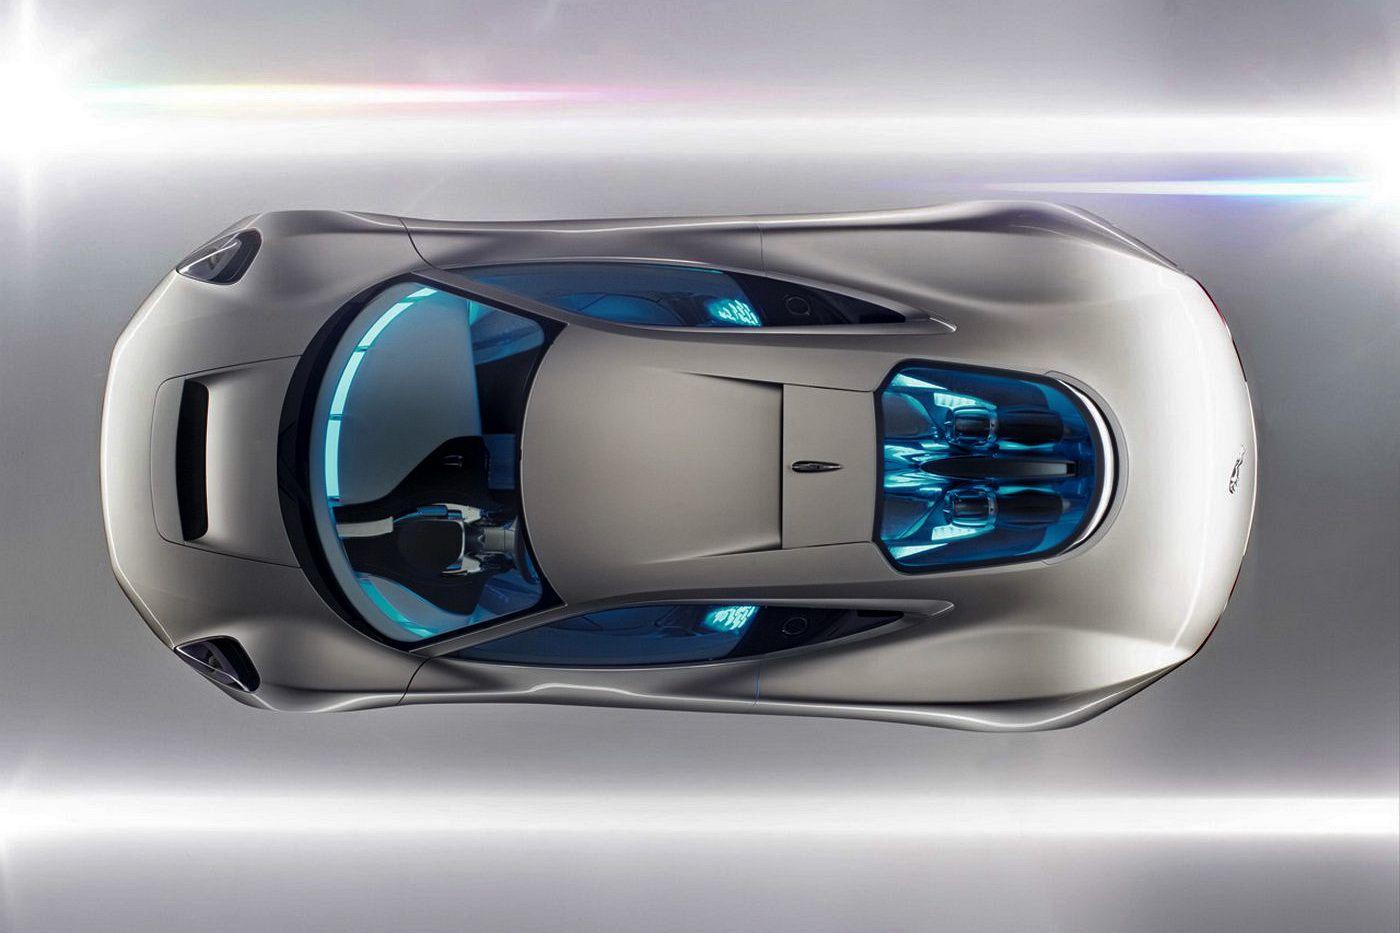 Charmant Jaguar C X75 Supercar Will Not Be Produced | AutoTribute